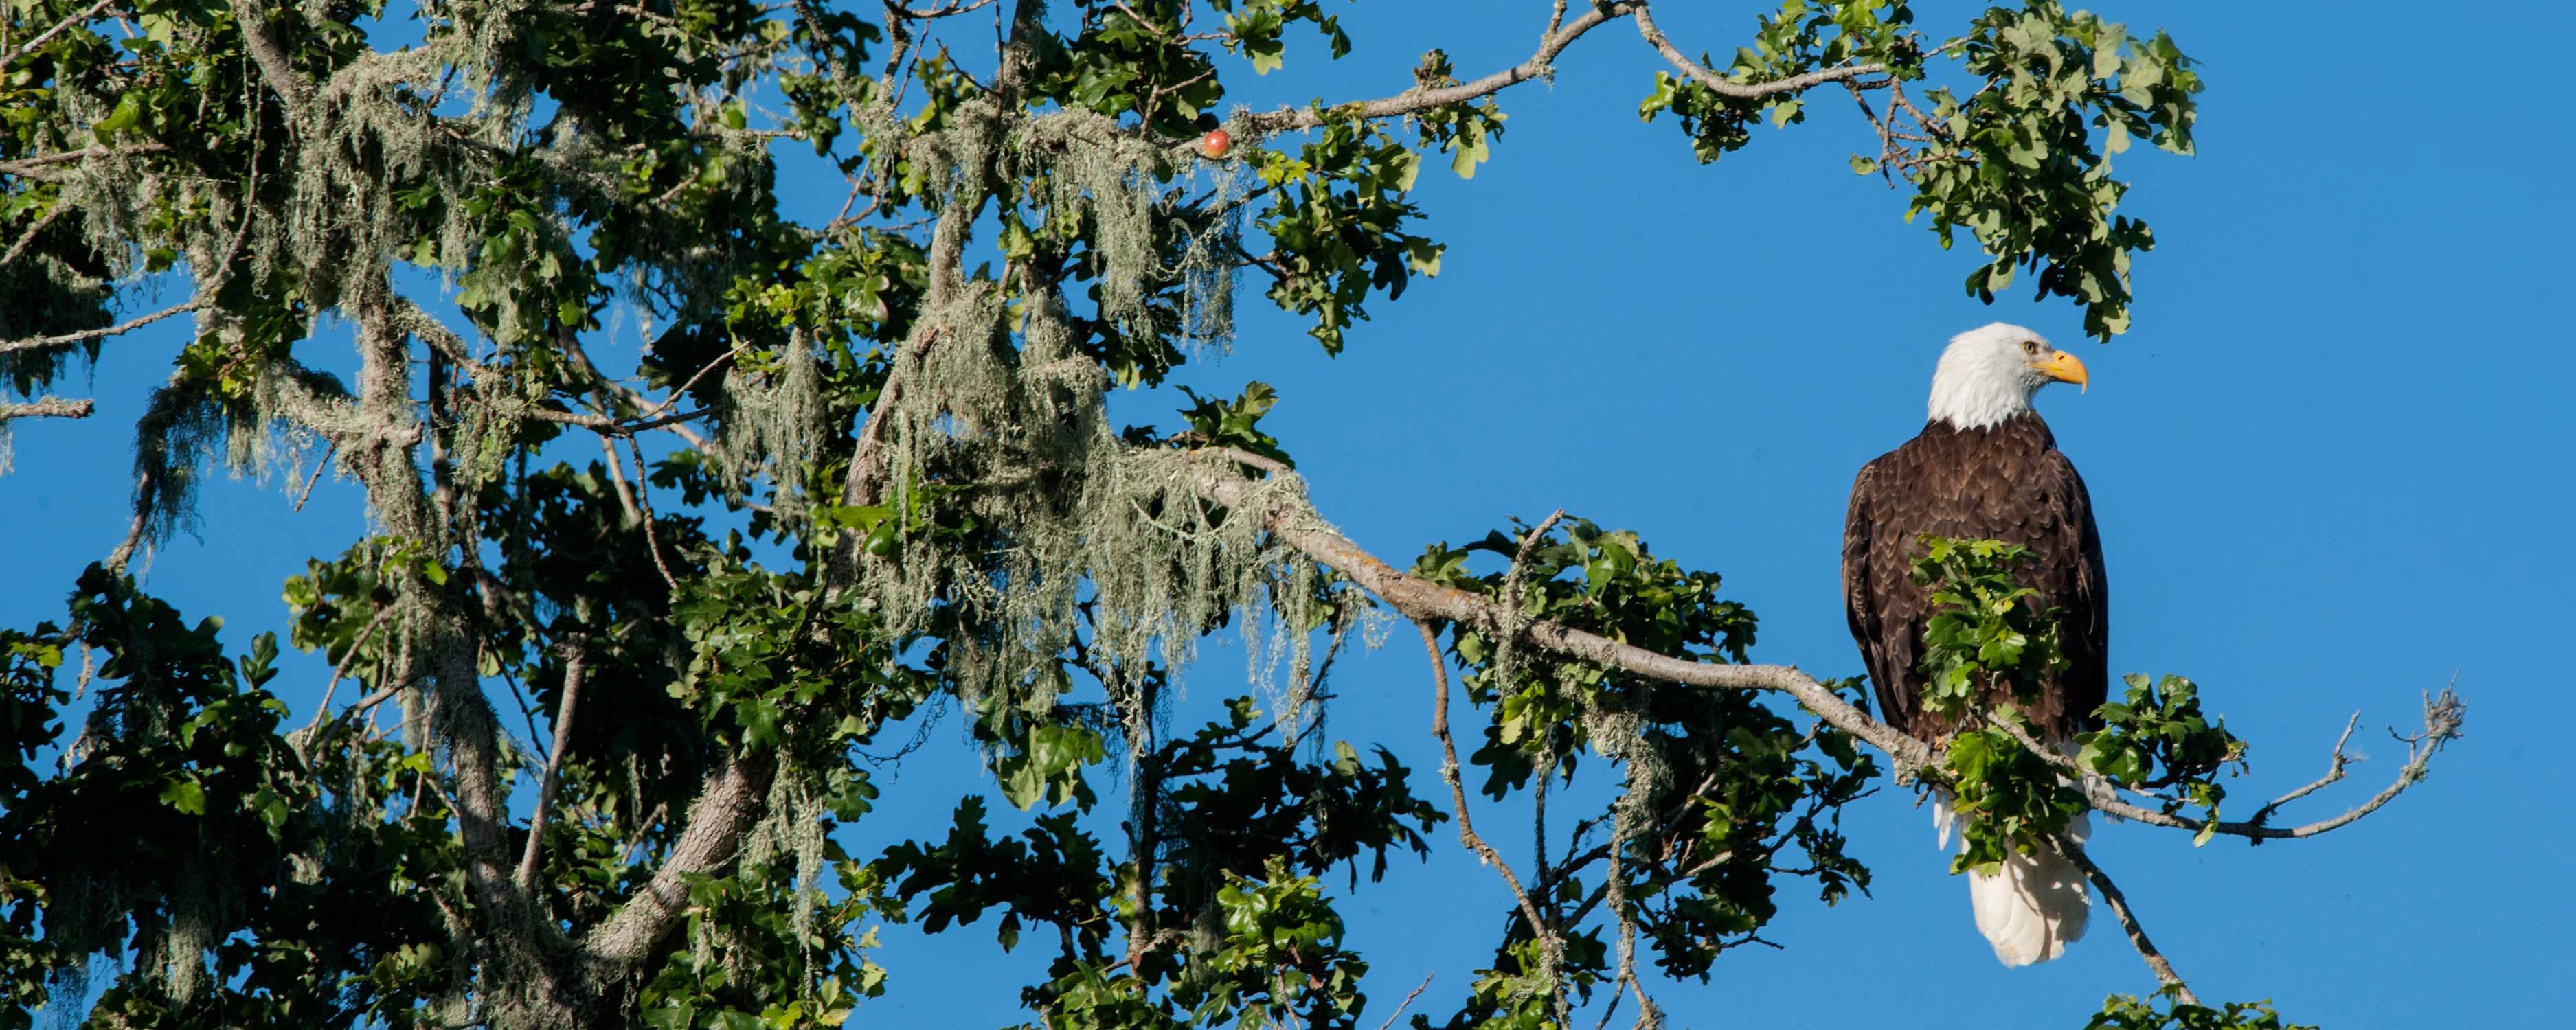 birdwatching at Alisal - Alisal Resort in Solvang California